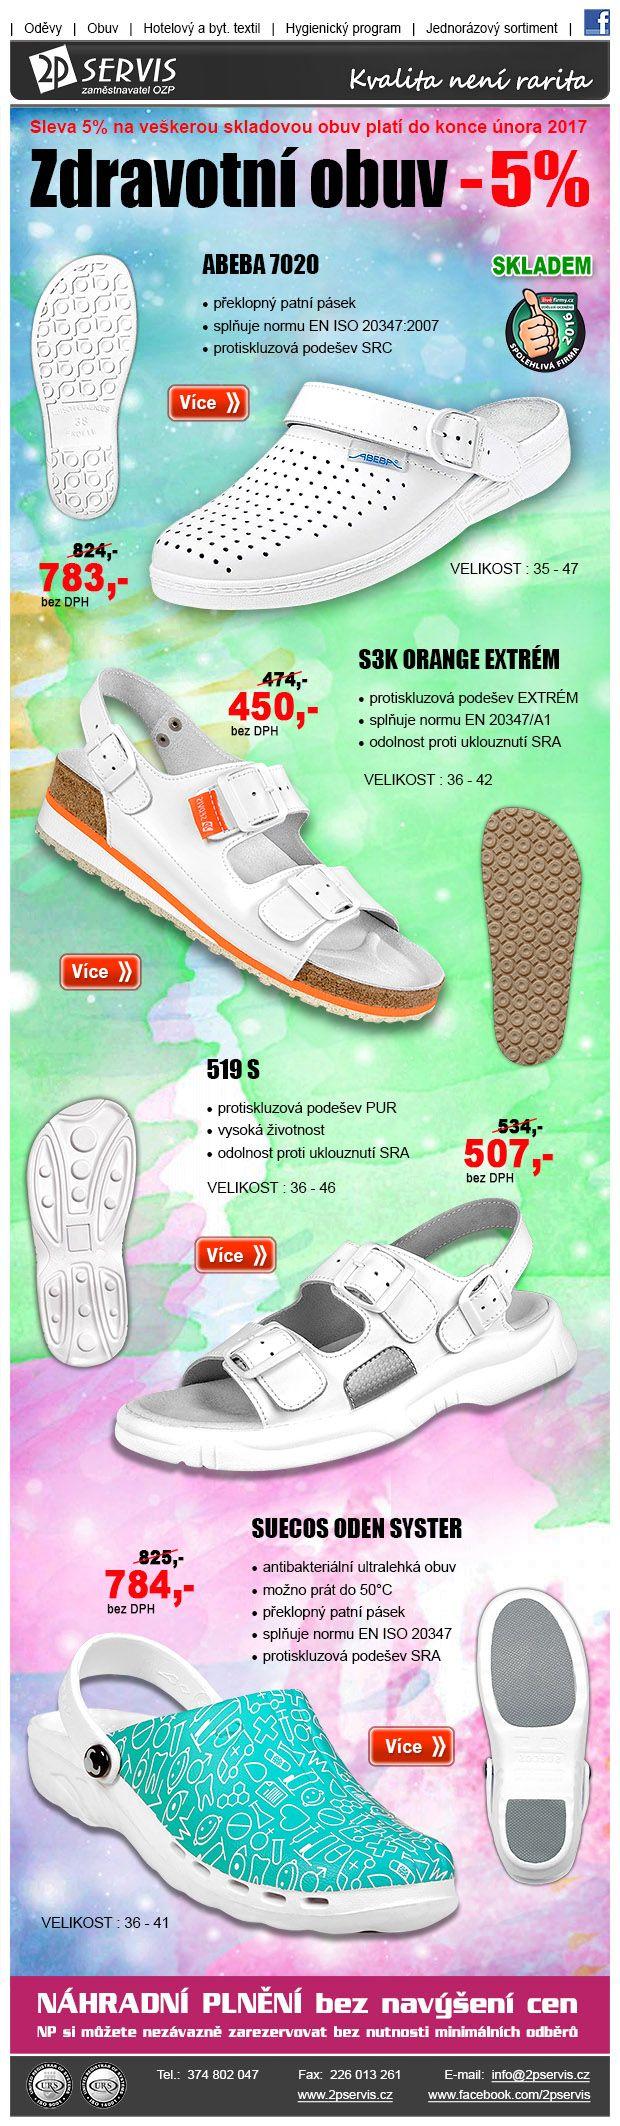 ★ ★ Nenechte nás ladem, ležíme tu skladem – Sleva 5% na certifikovanou obuv ★ ★